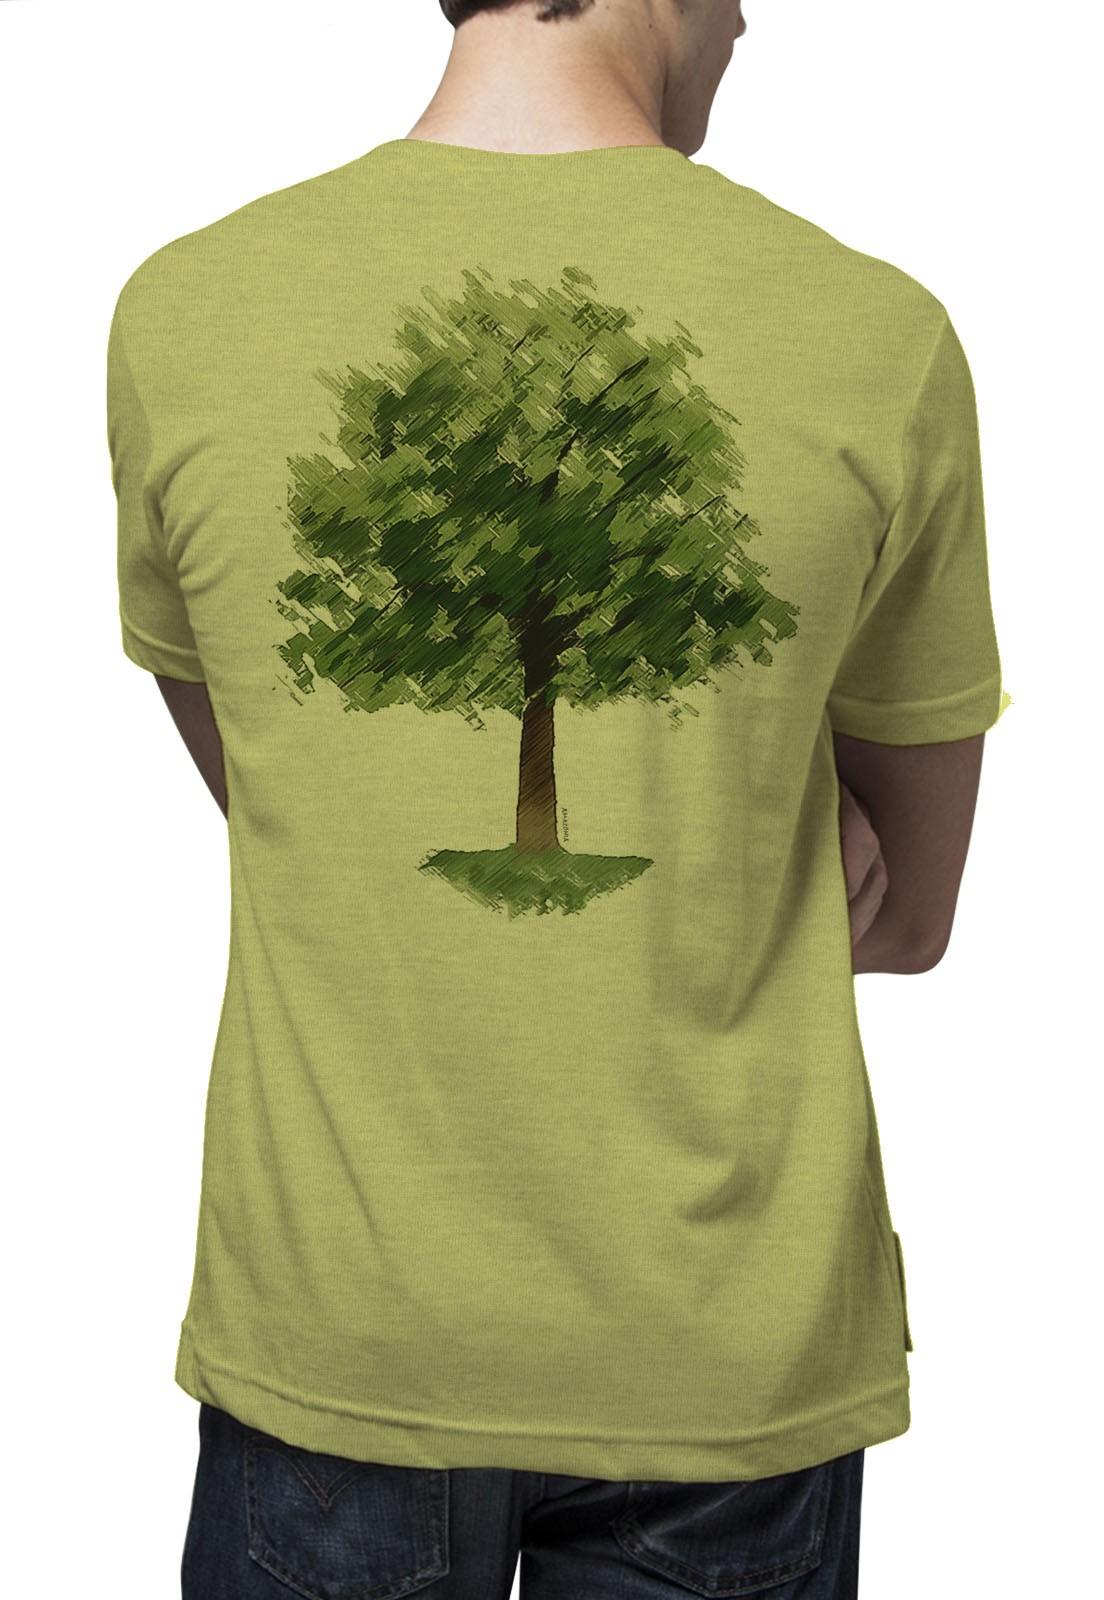 Camiseta Amazônia Chalk Tree - Mescla Amarelo